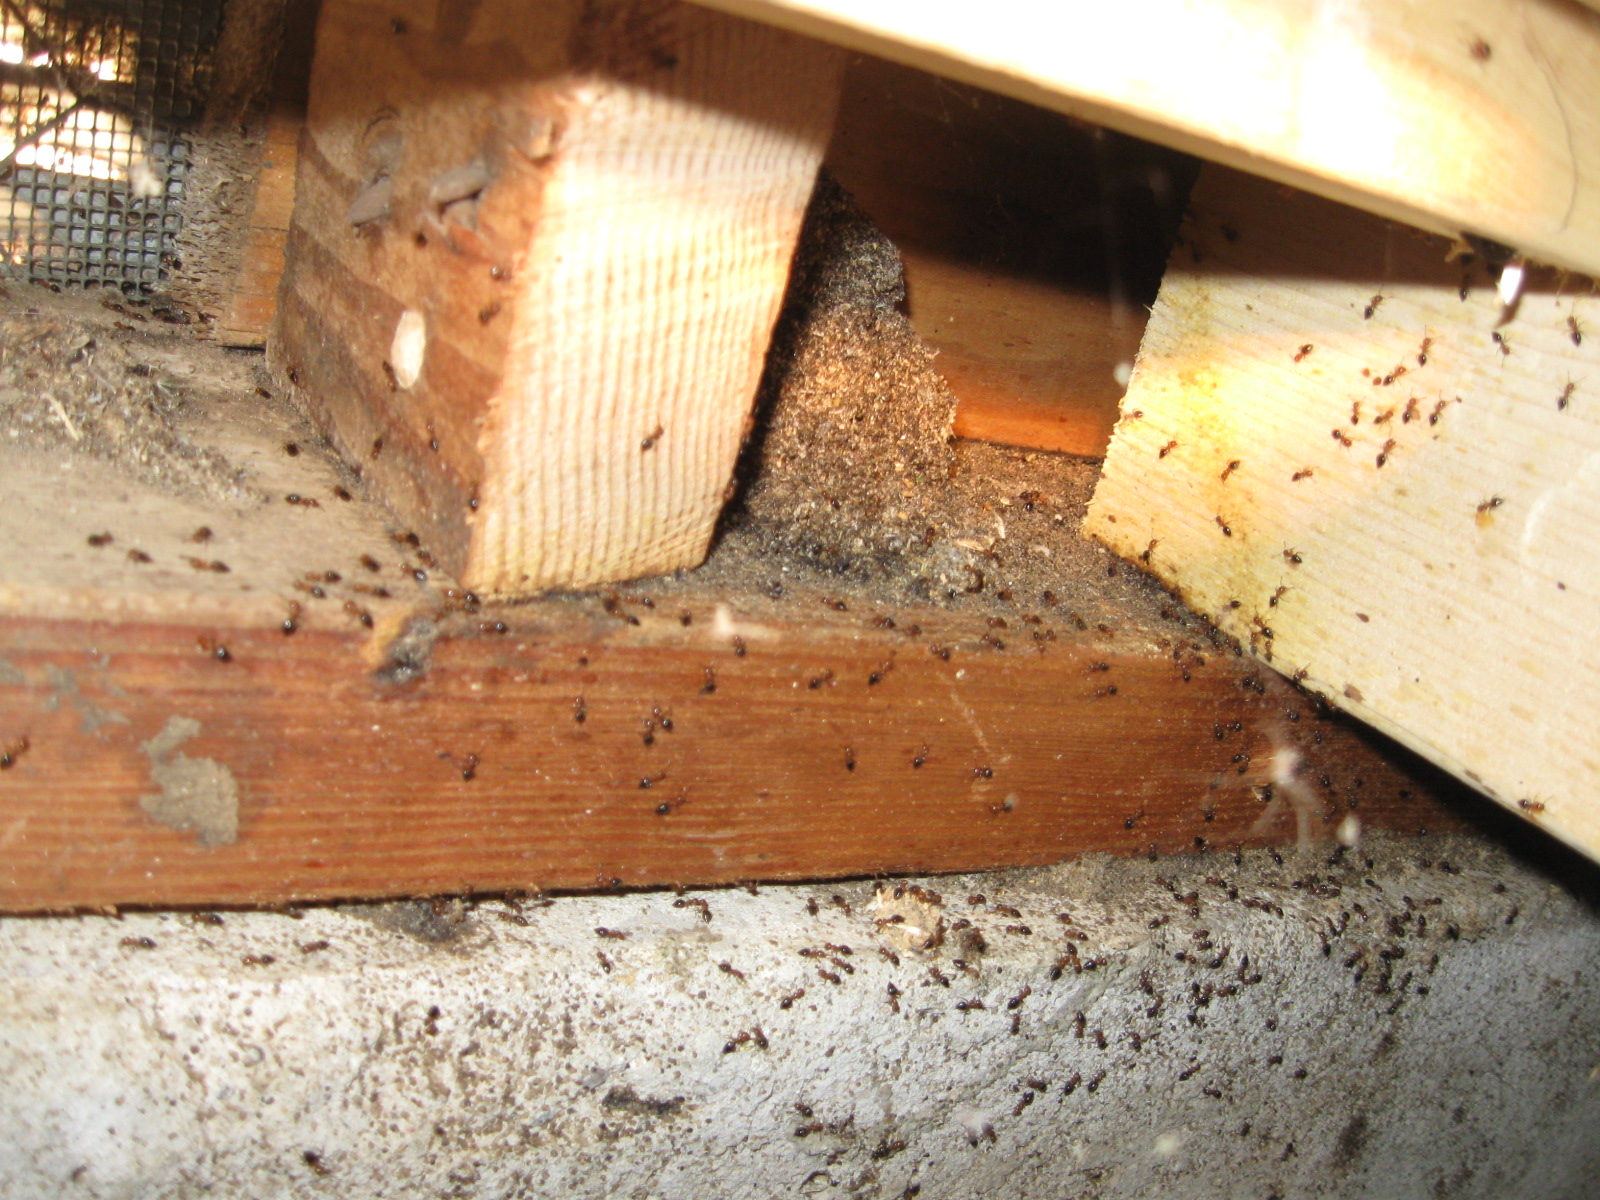 Pest Indentifier Additionally D29vZC1ib3JpbmcgYmVldGxl In Addition